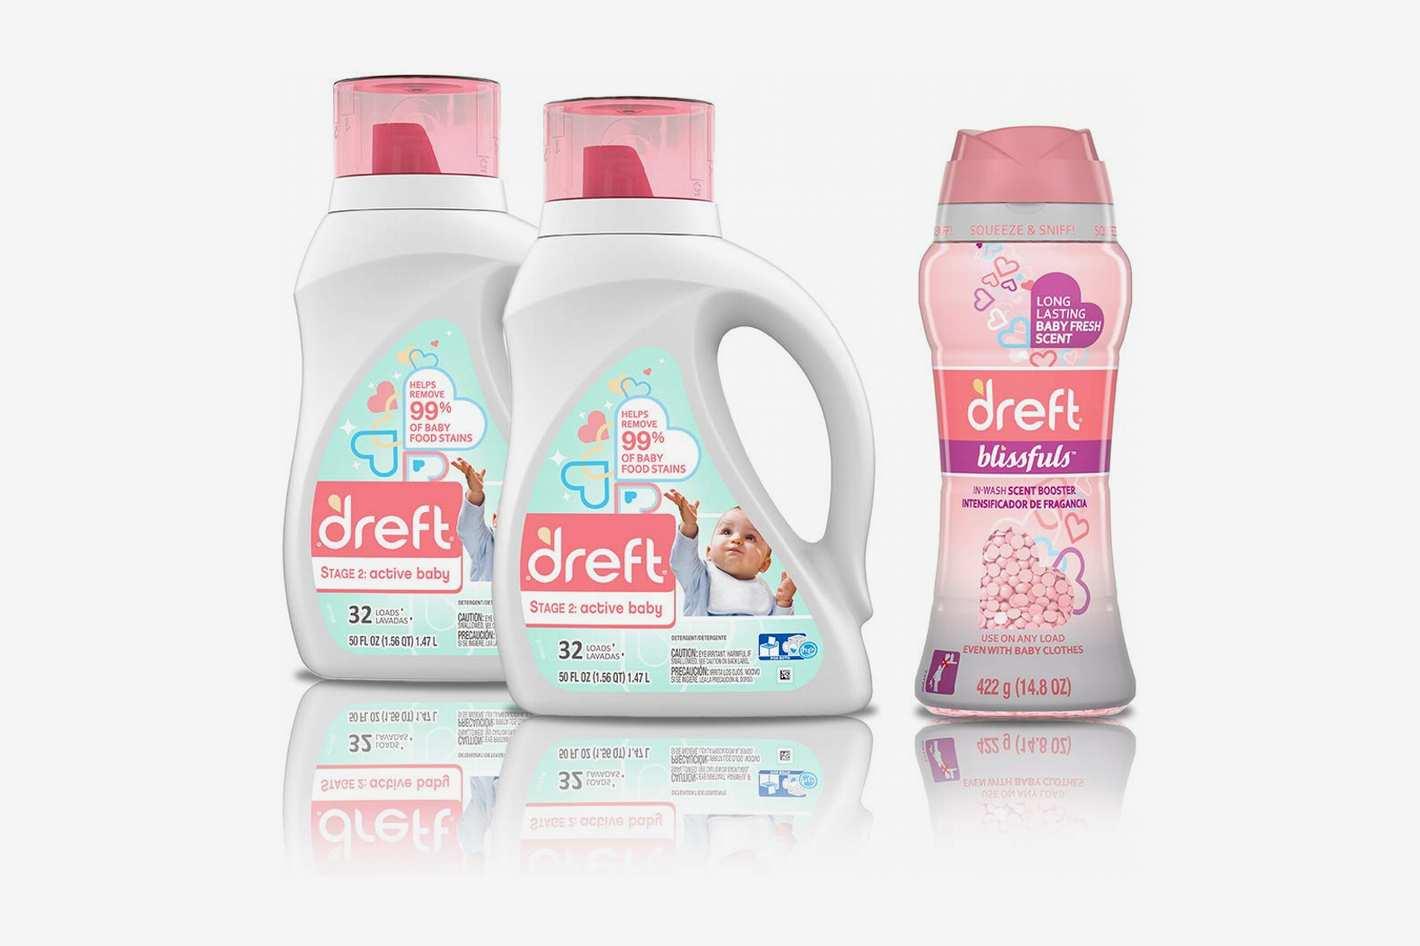 Dreft Stage 2: Active Hypoallergenic Liquid Baby Laundry Detergent